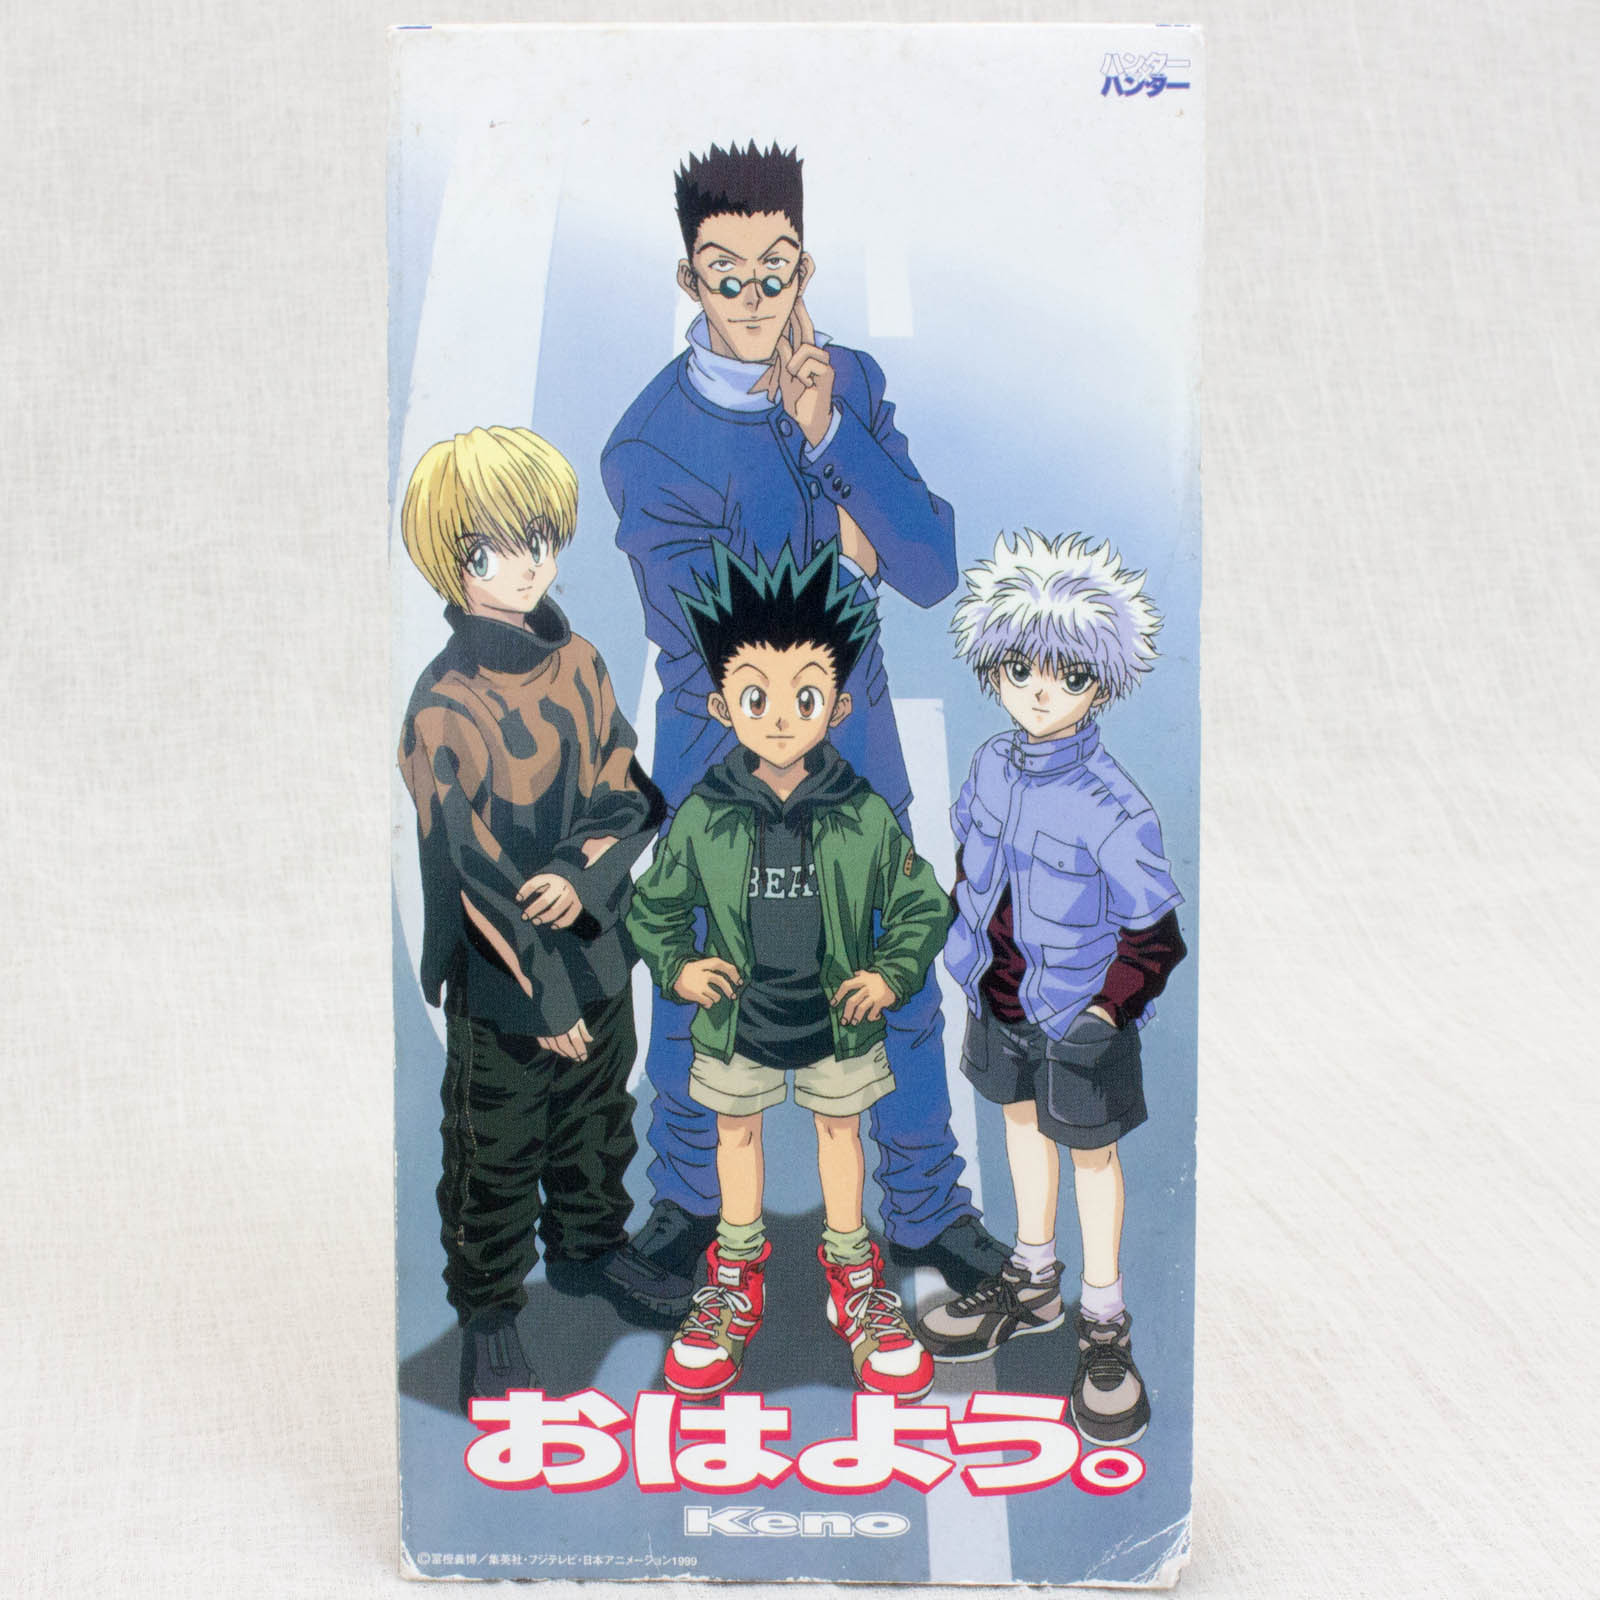 HUNTER x HUNTER Ohayo/Keno 3 Inch (8cm) Single JAPAN ANIME CD